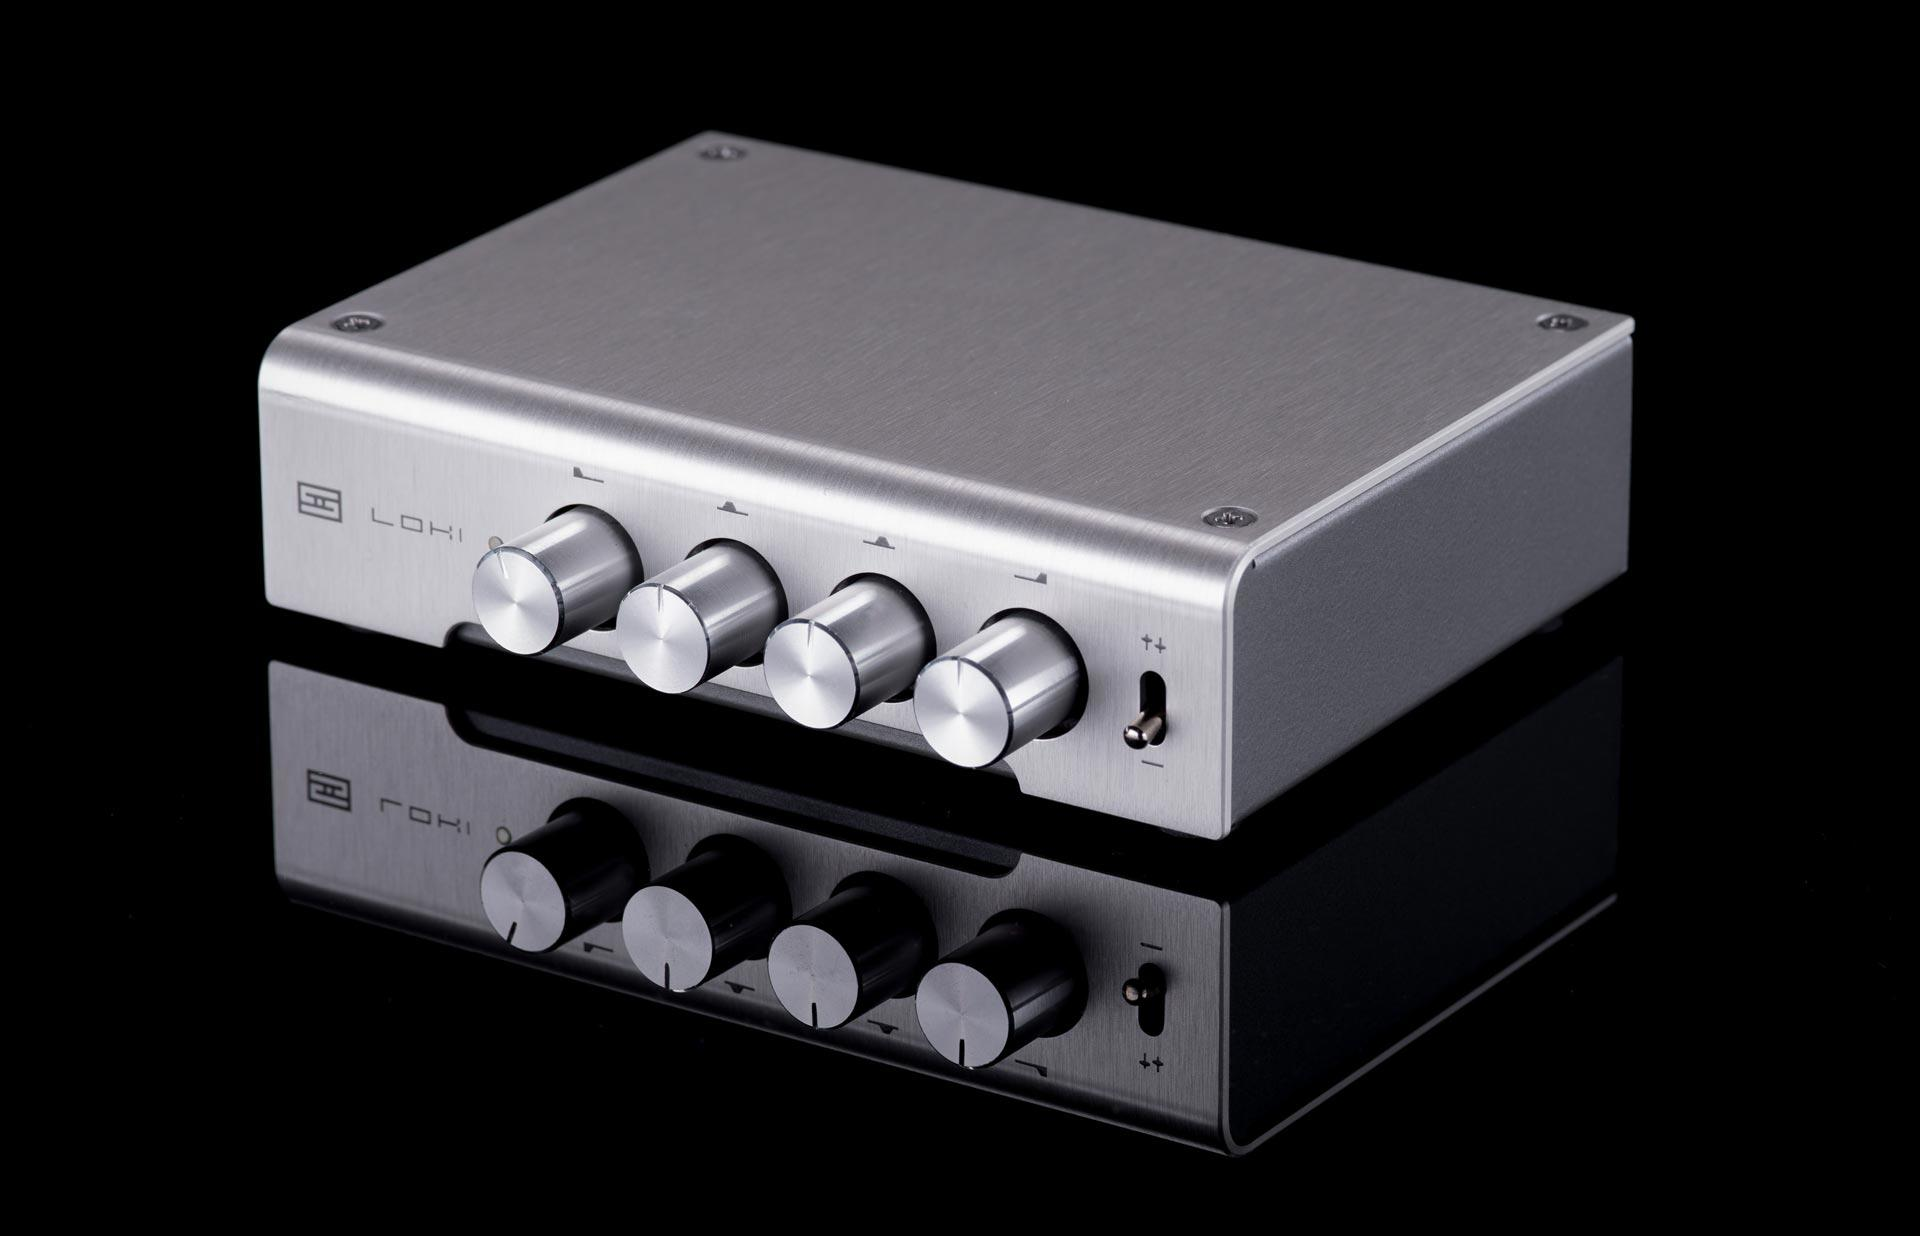 Loki Mini Impressions Headphone Reviews And Discussion Hi Fi Tone Control High Quality Img